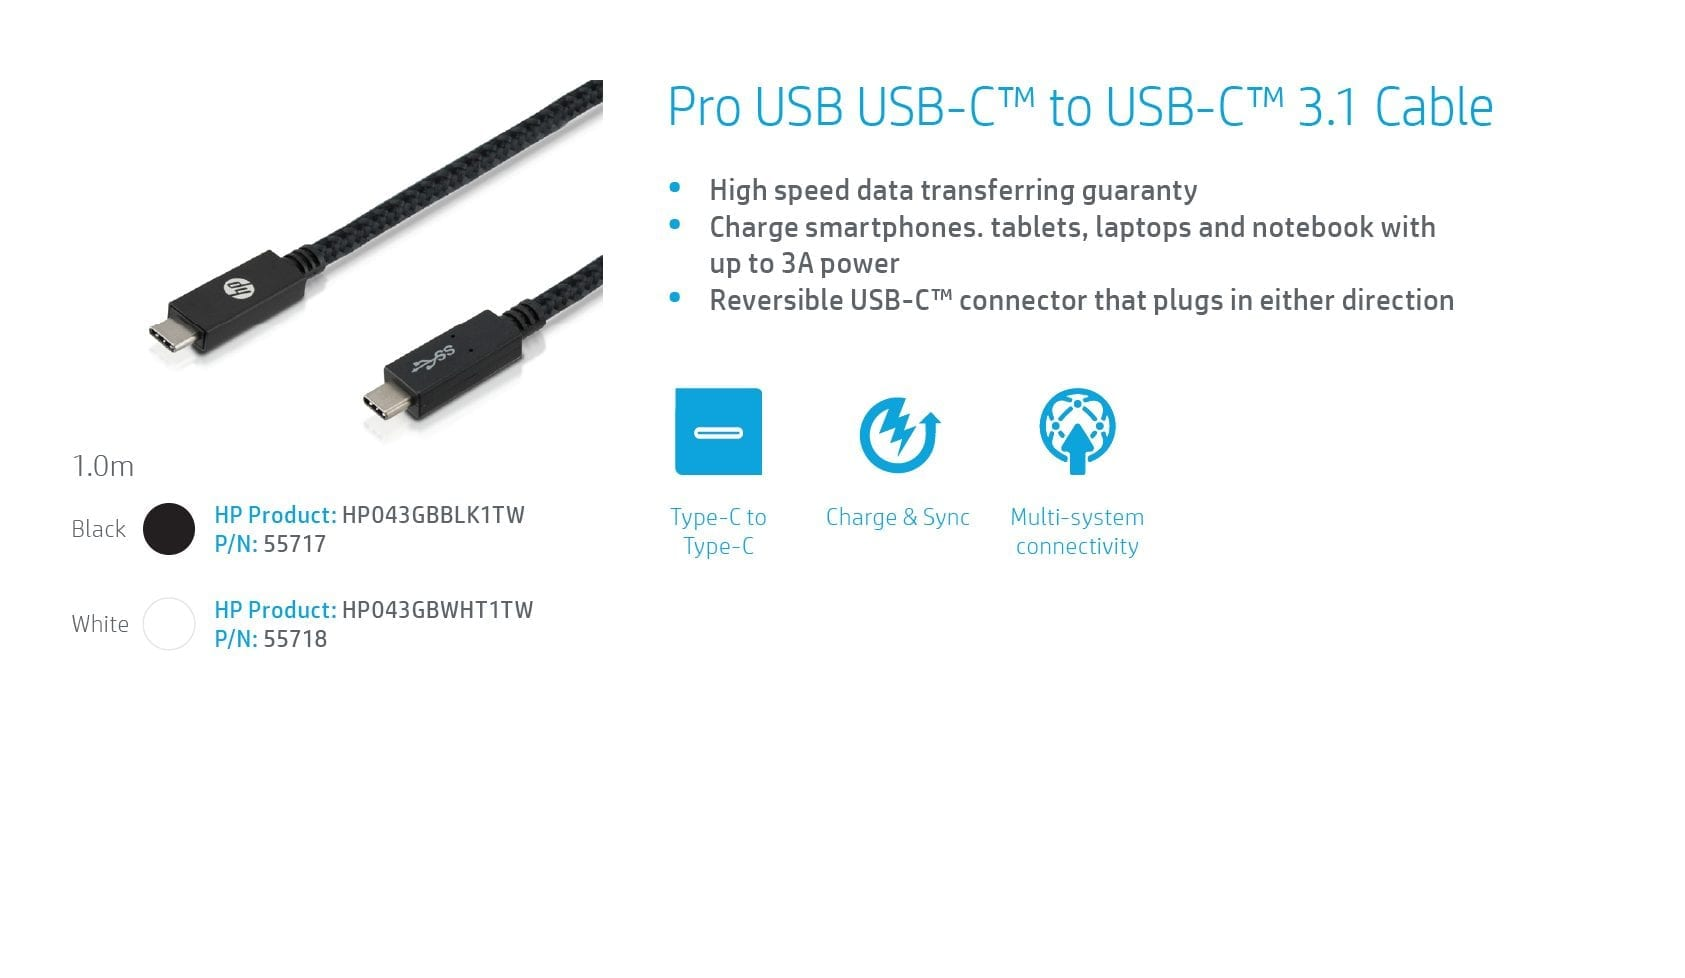 HP Pro USB-C TO USB-C PD v3.1 BLK 1.0m 7